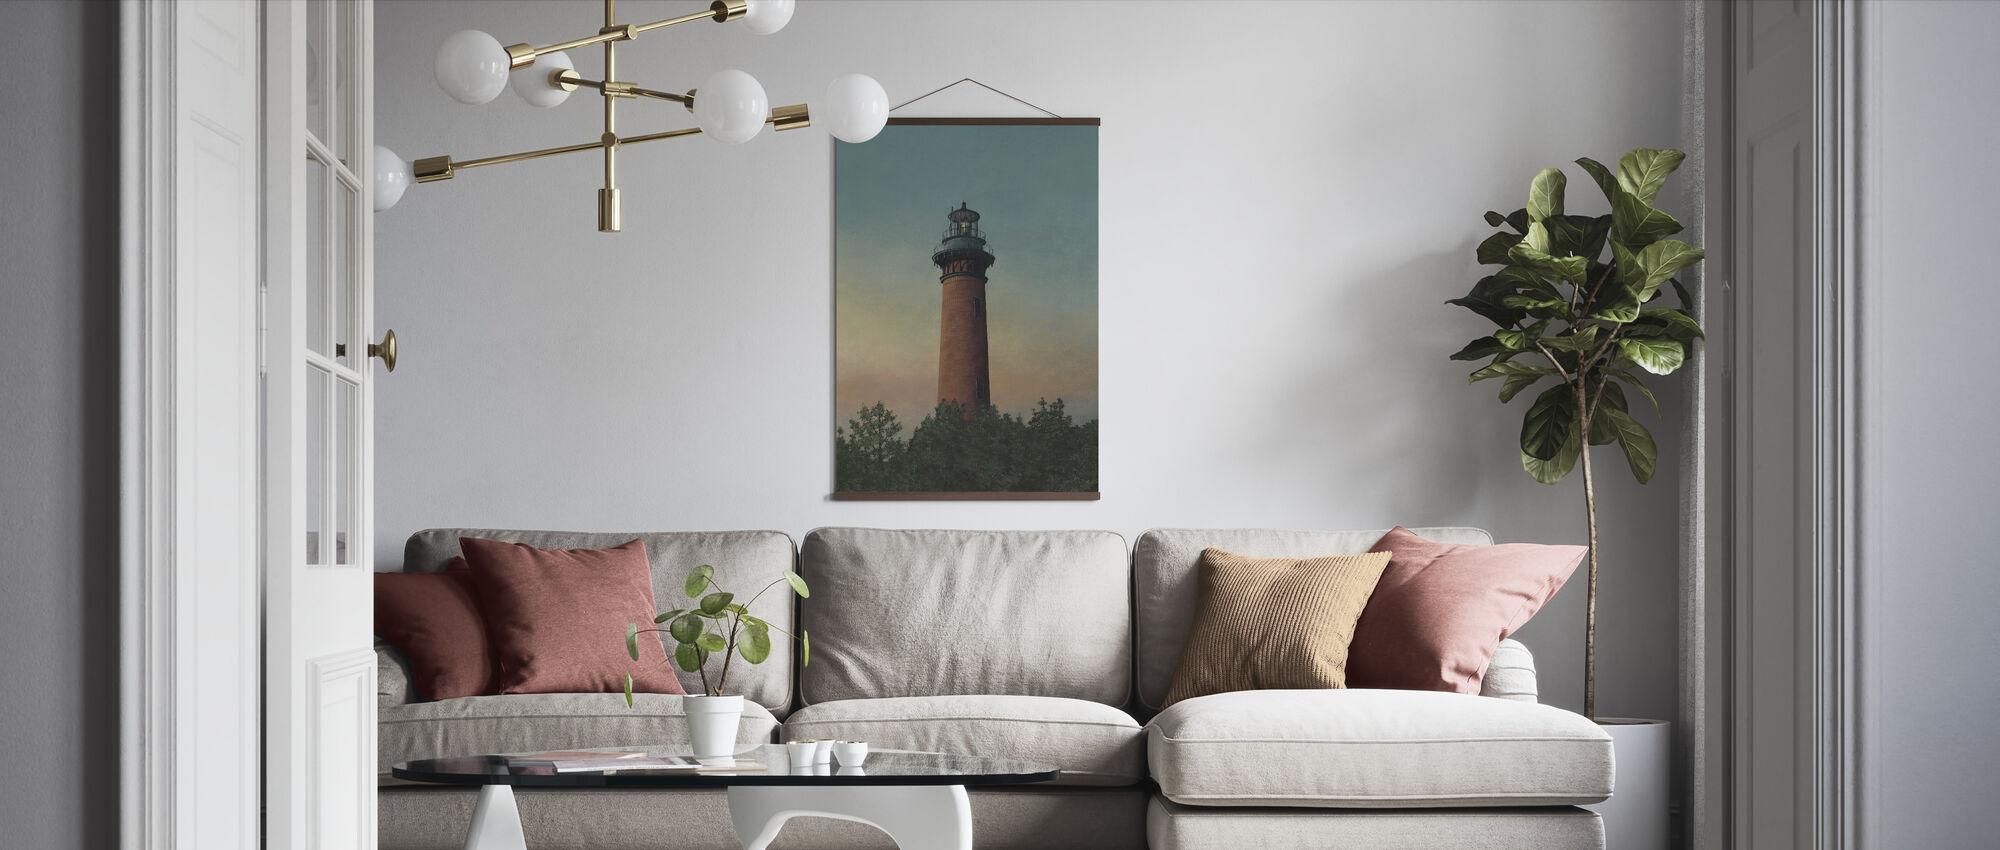 Currituck Beach Lighthouse - Poster - Living Room